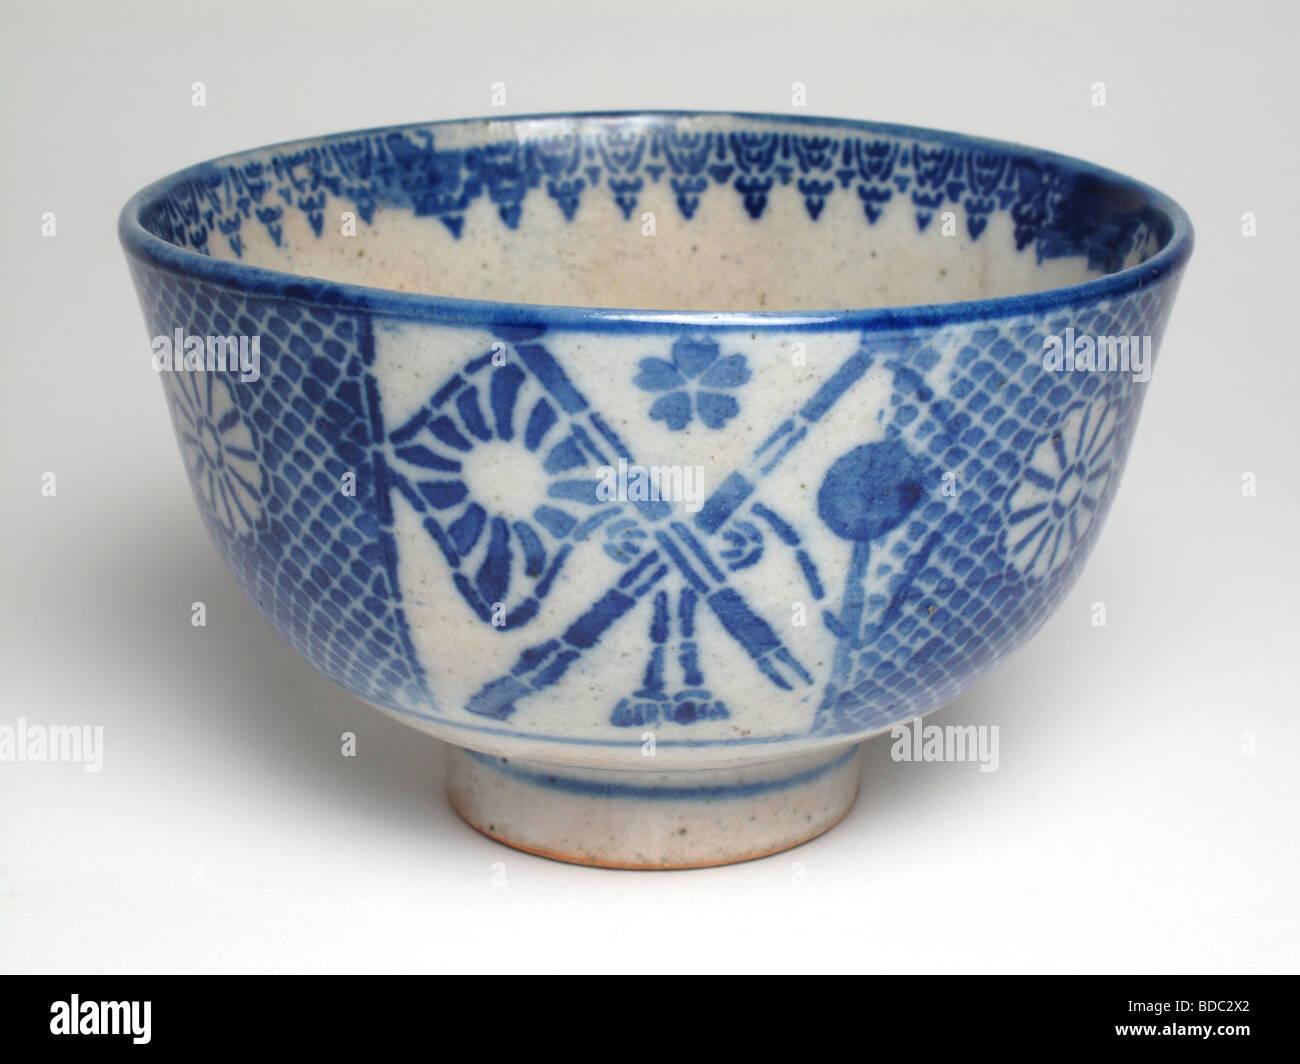 Antique japanese pottery tea bowl stock photo 25466618 alamy antique japanese pottery tea bowl reviewsmspy